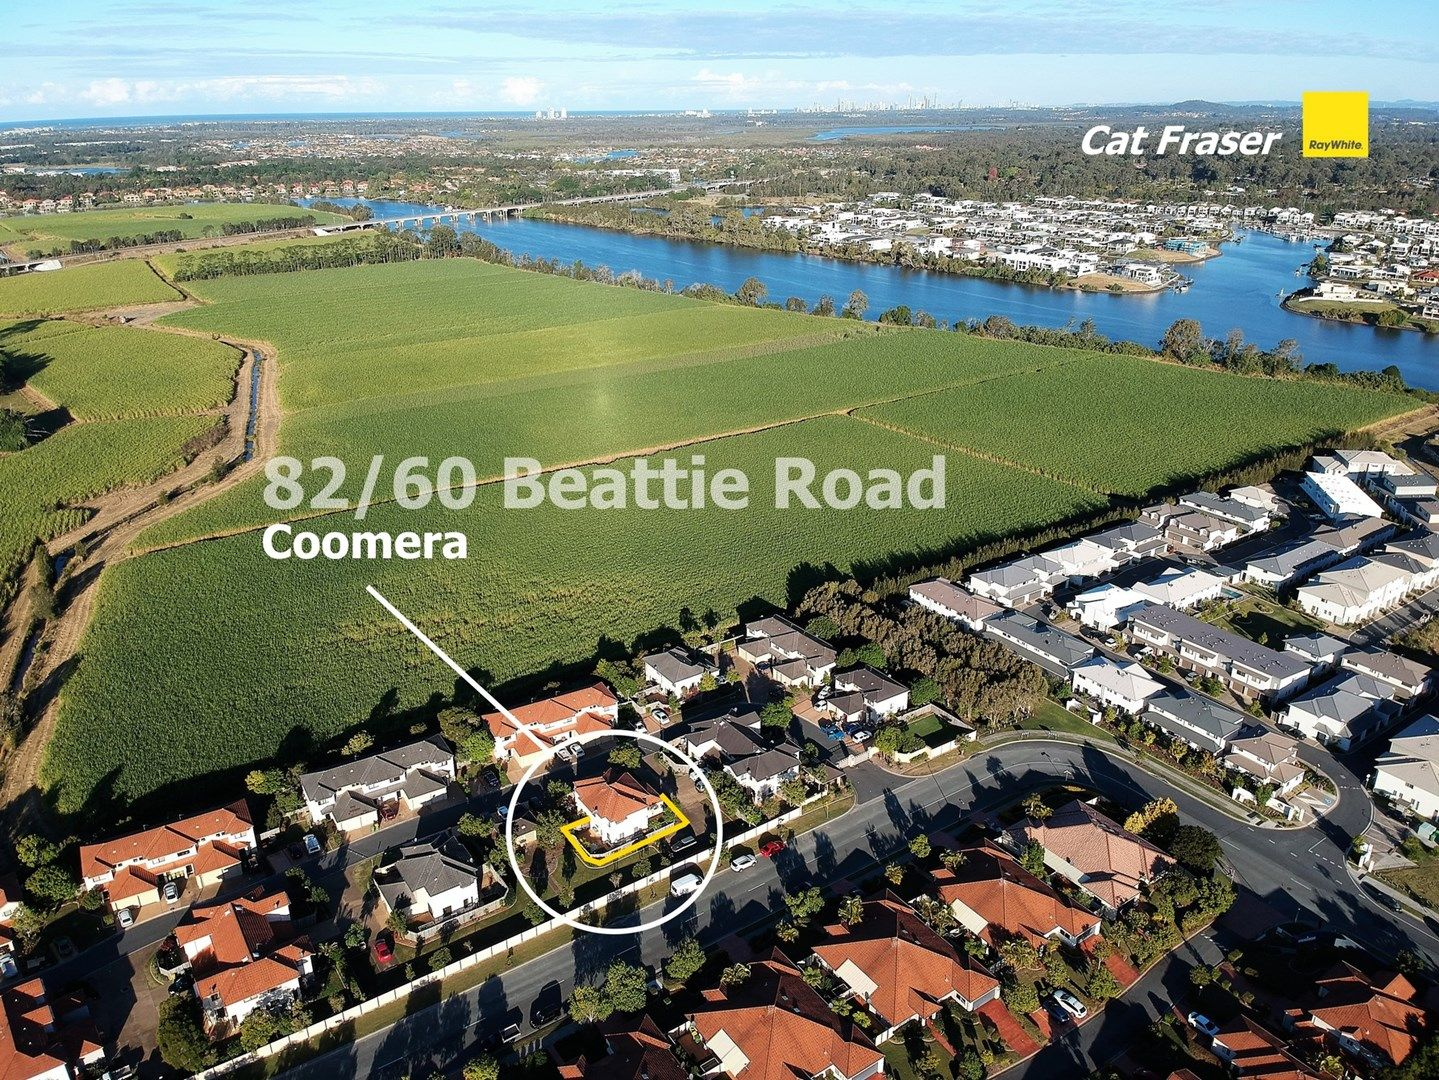 82/60 Beattie Road, Coomera QLD 4209, Image 2